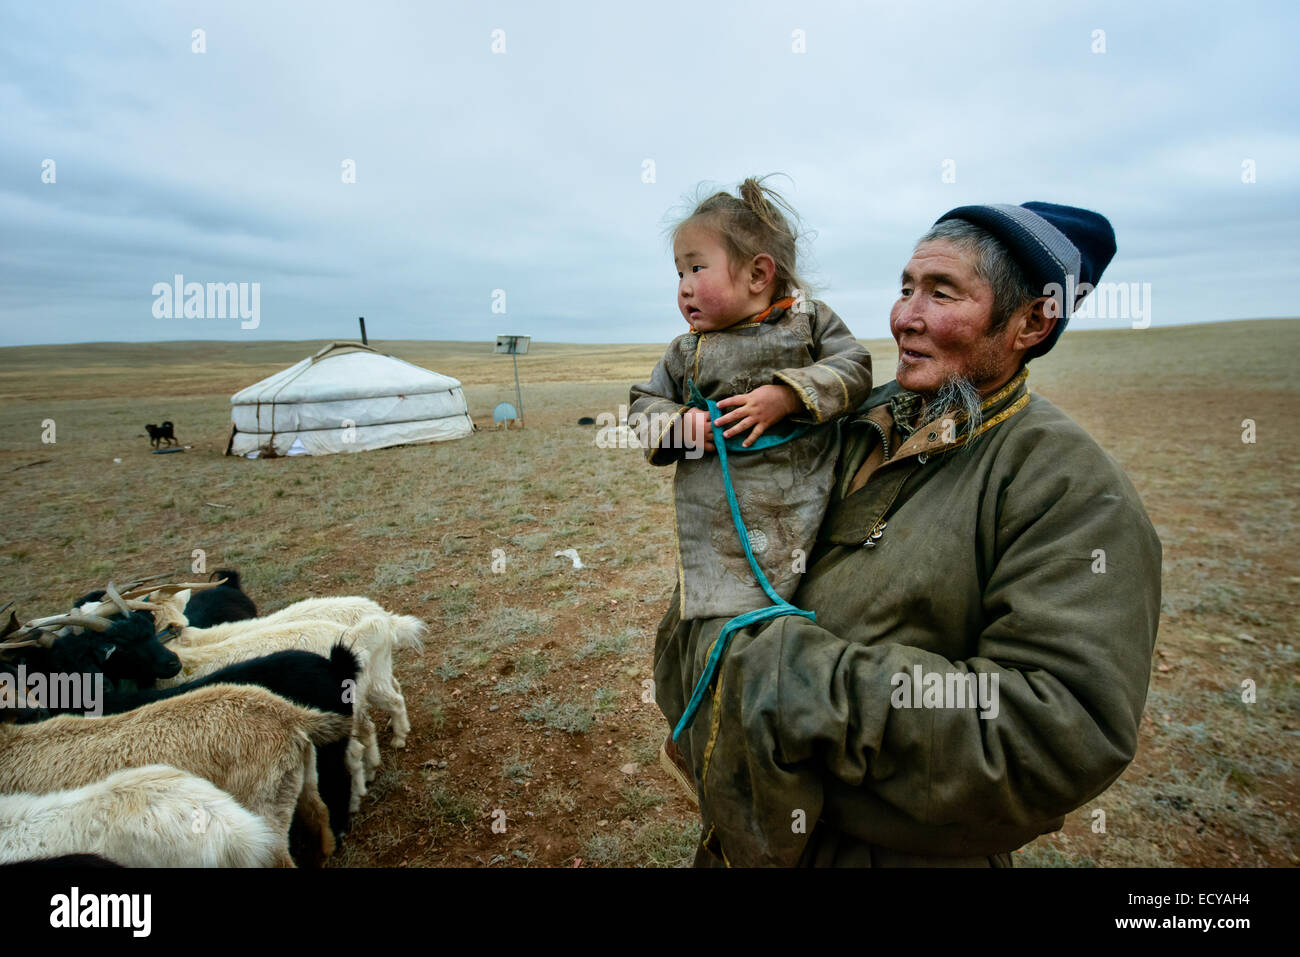 Grandfather and granddaughter on the Gobi desert, Mongolia - Stock Image